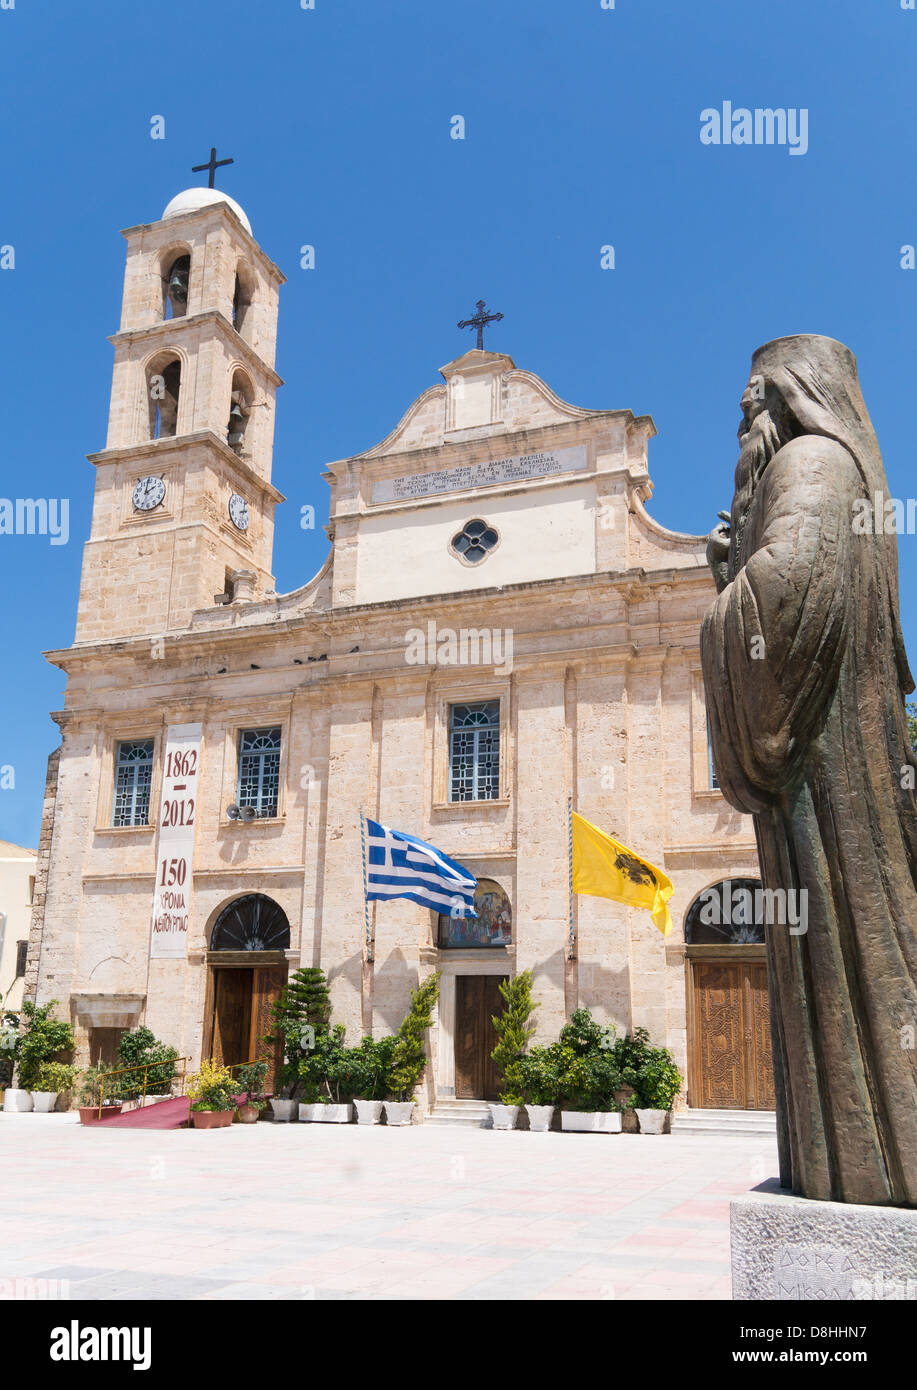 Chania cathedral, Crete, Greece. Stock Photo